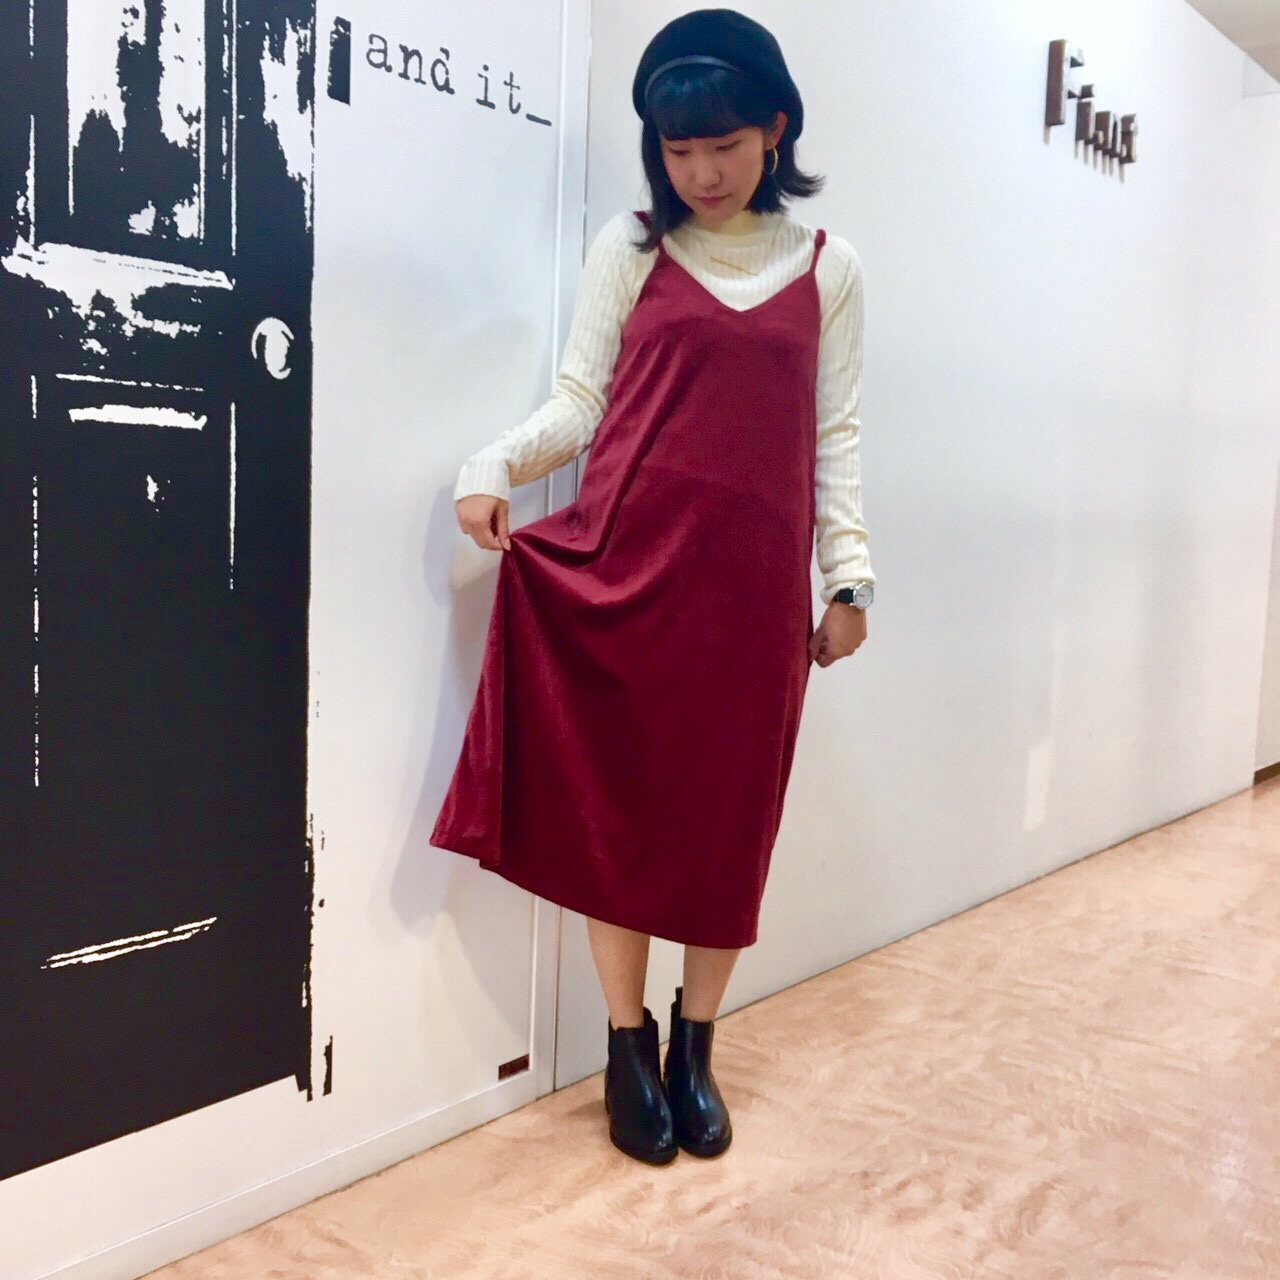 fc2blog_20161117144143f6f.jpg